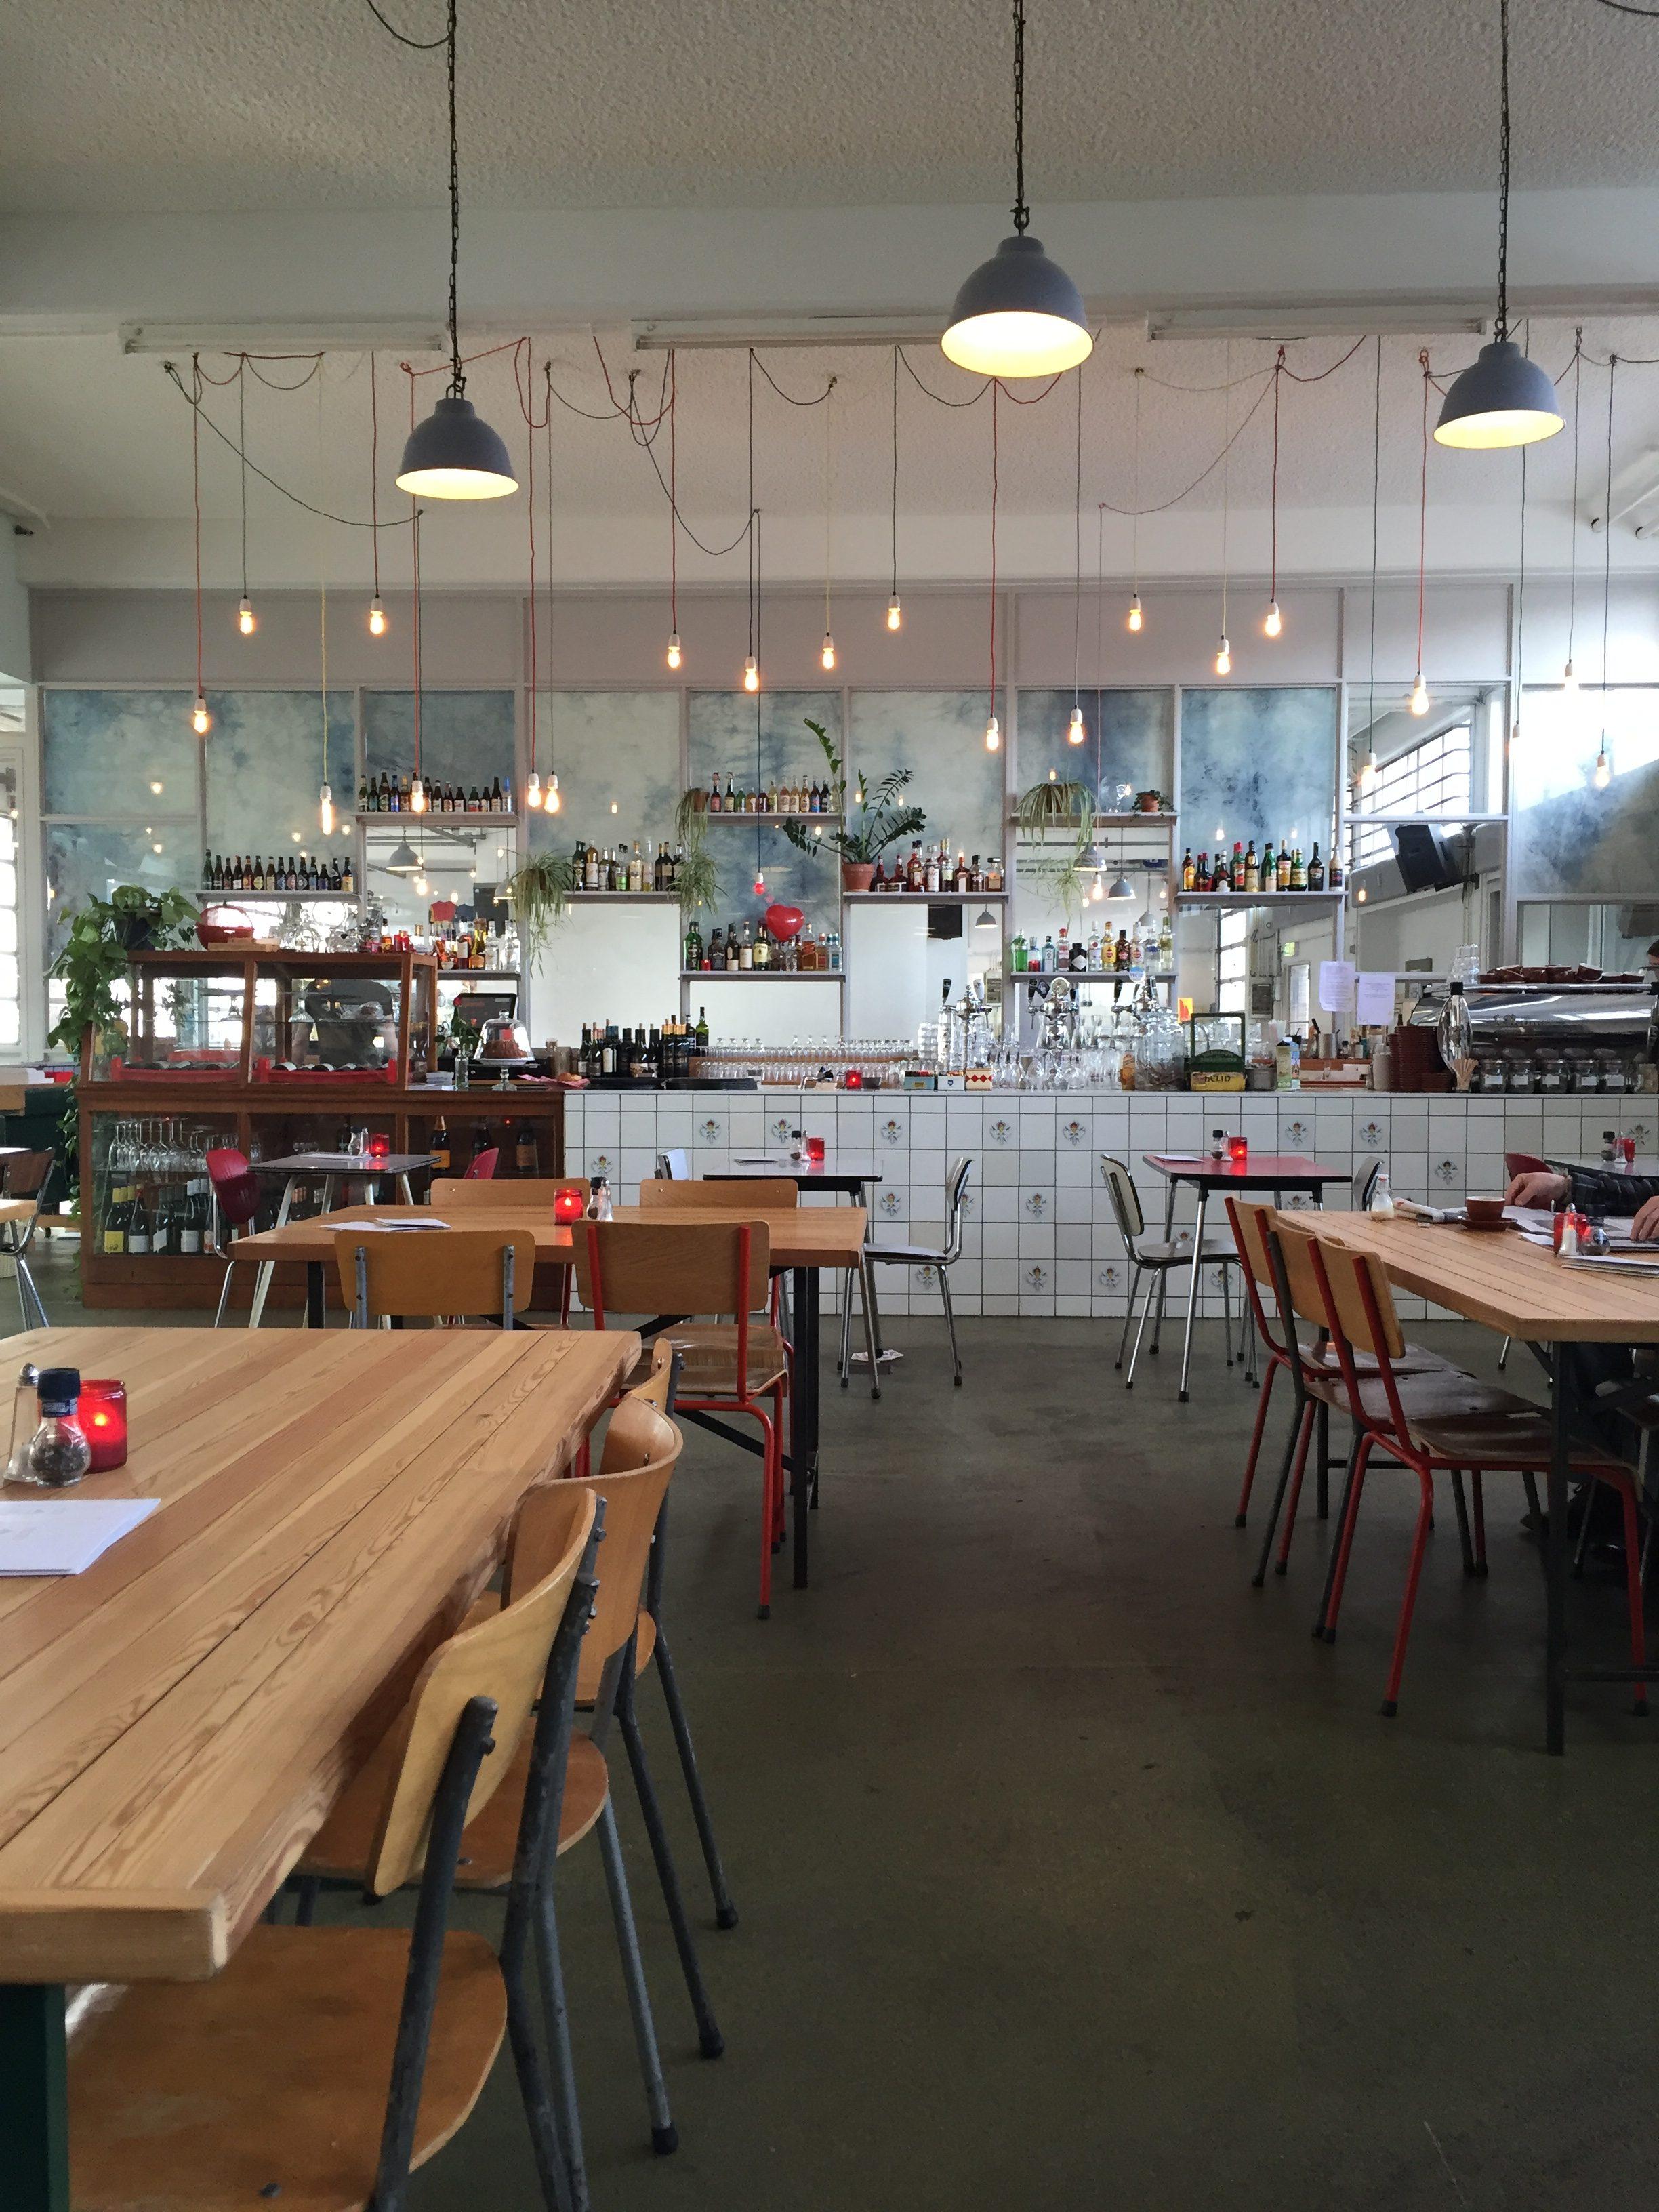 TRAVEL | De leukste, lekkerste én mooiste hotspots in Maastricht